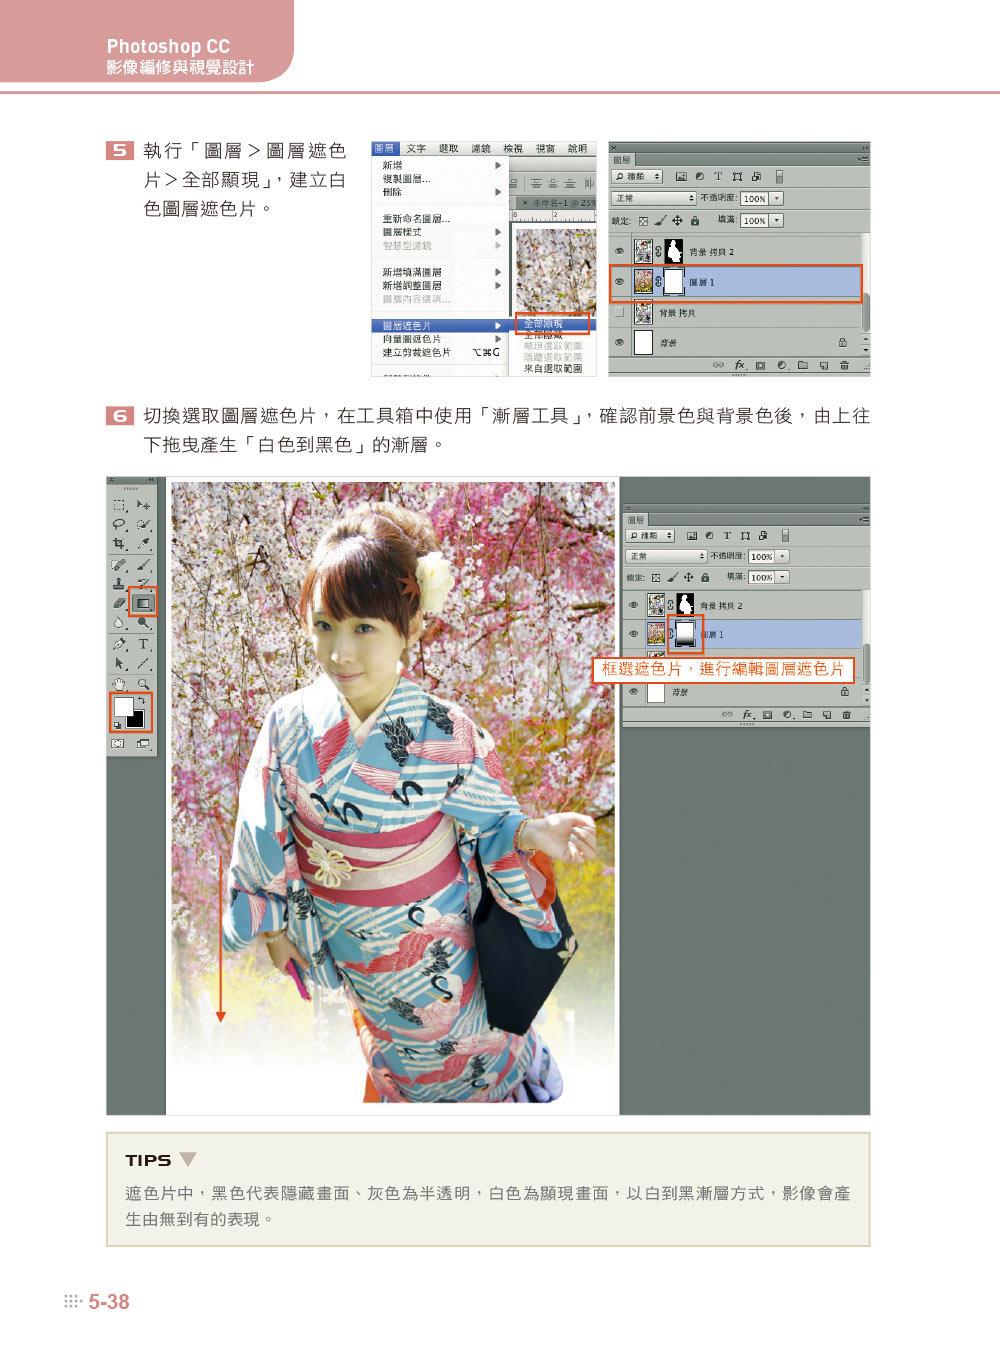 Photoshop CC 影像編修與視覺設計 (含ACA-Photoshop CC國際認證完全模擬與解題)-preview-7